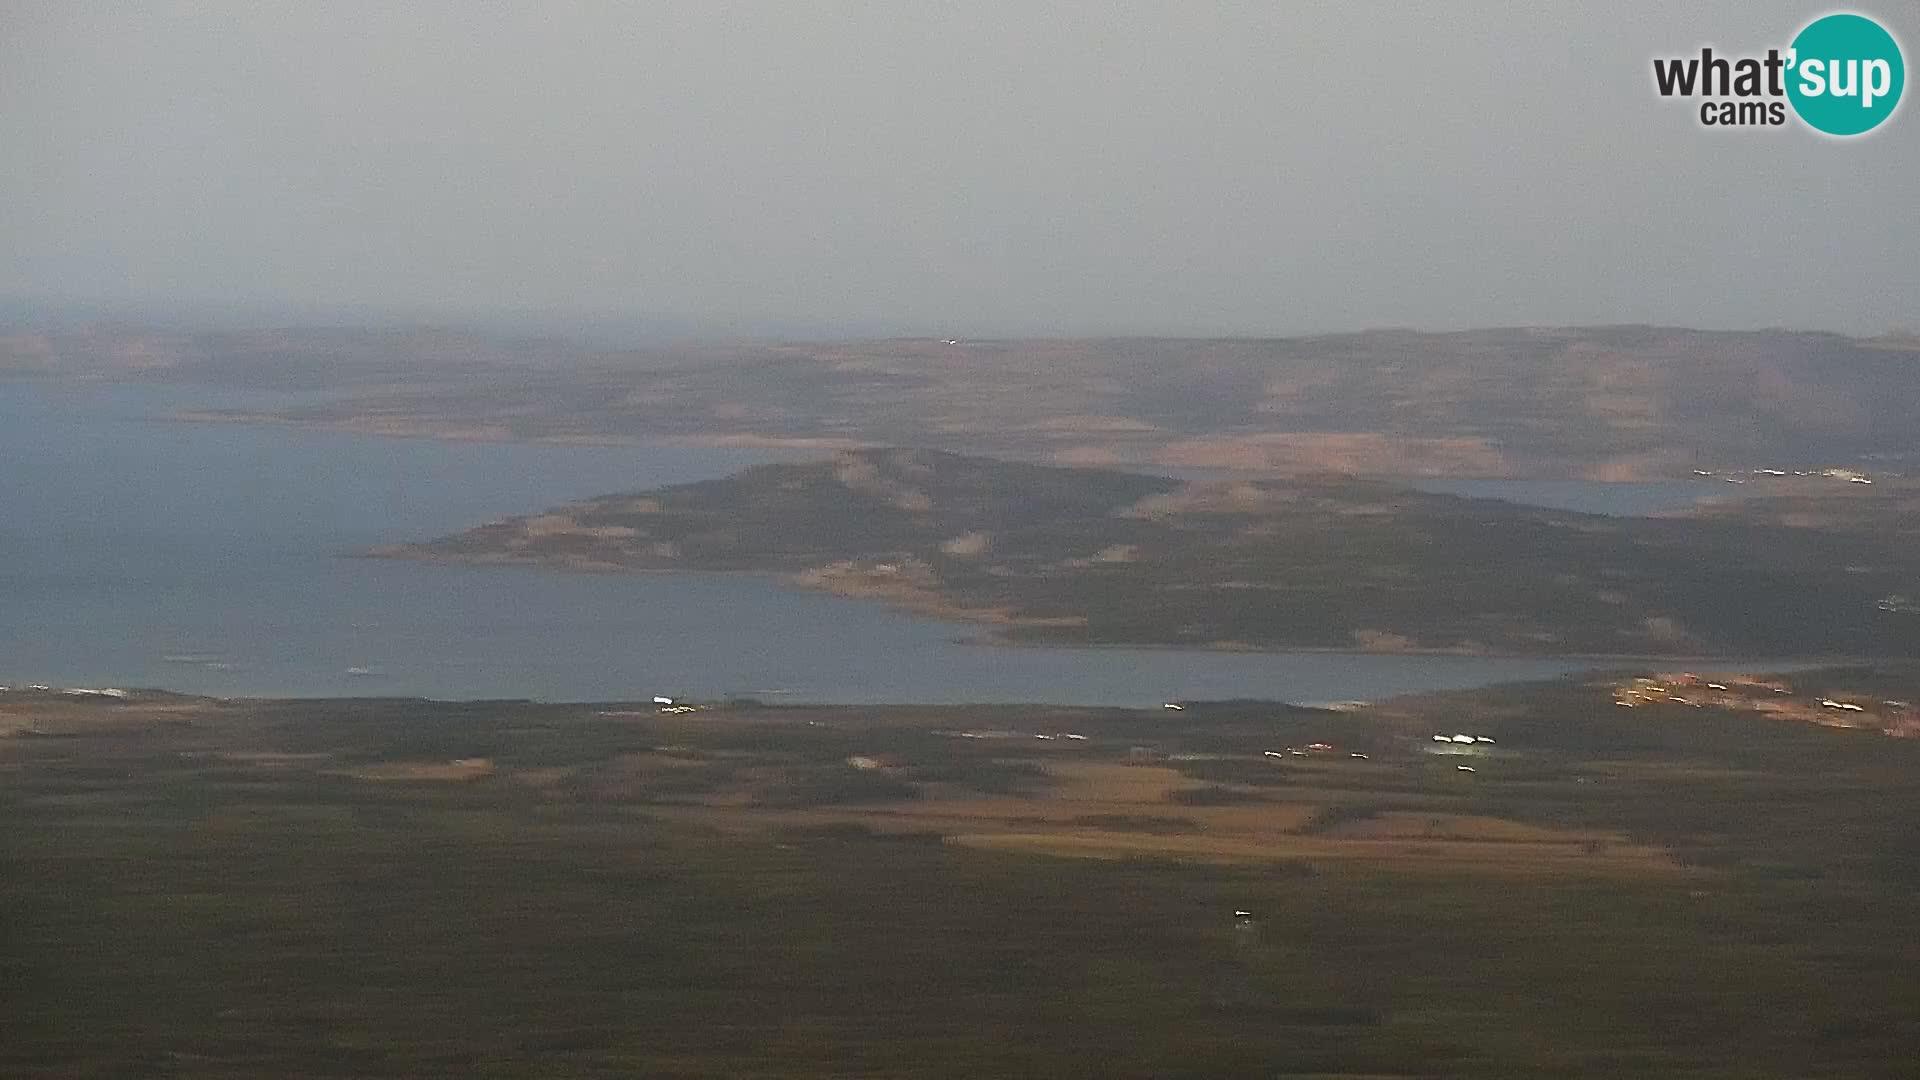 Livecam San Pasquale – Santa Teresa Gallura – Sardaigne webcam